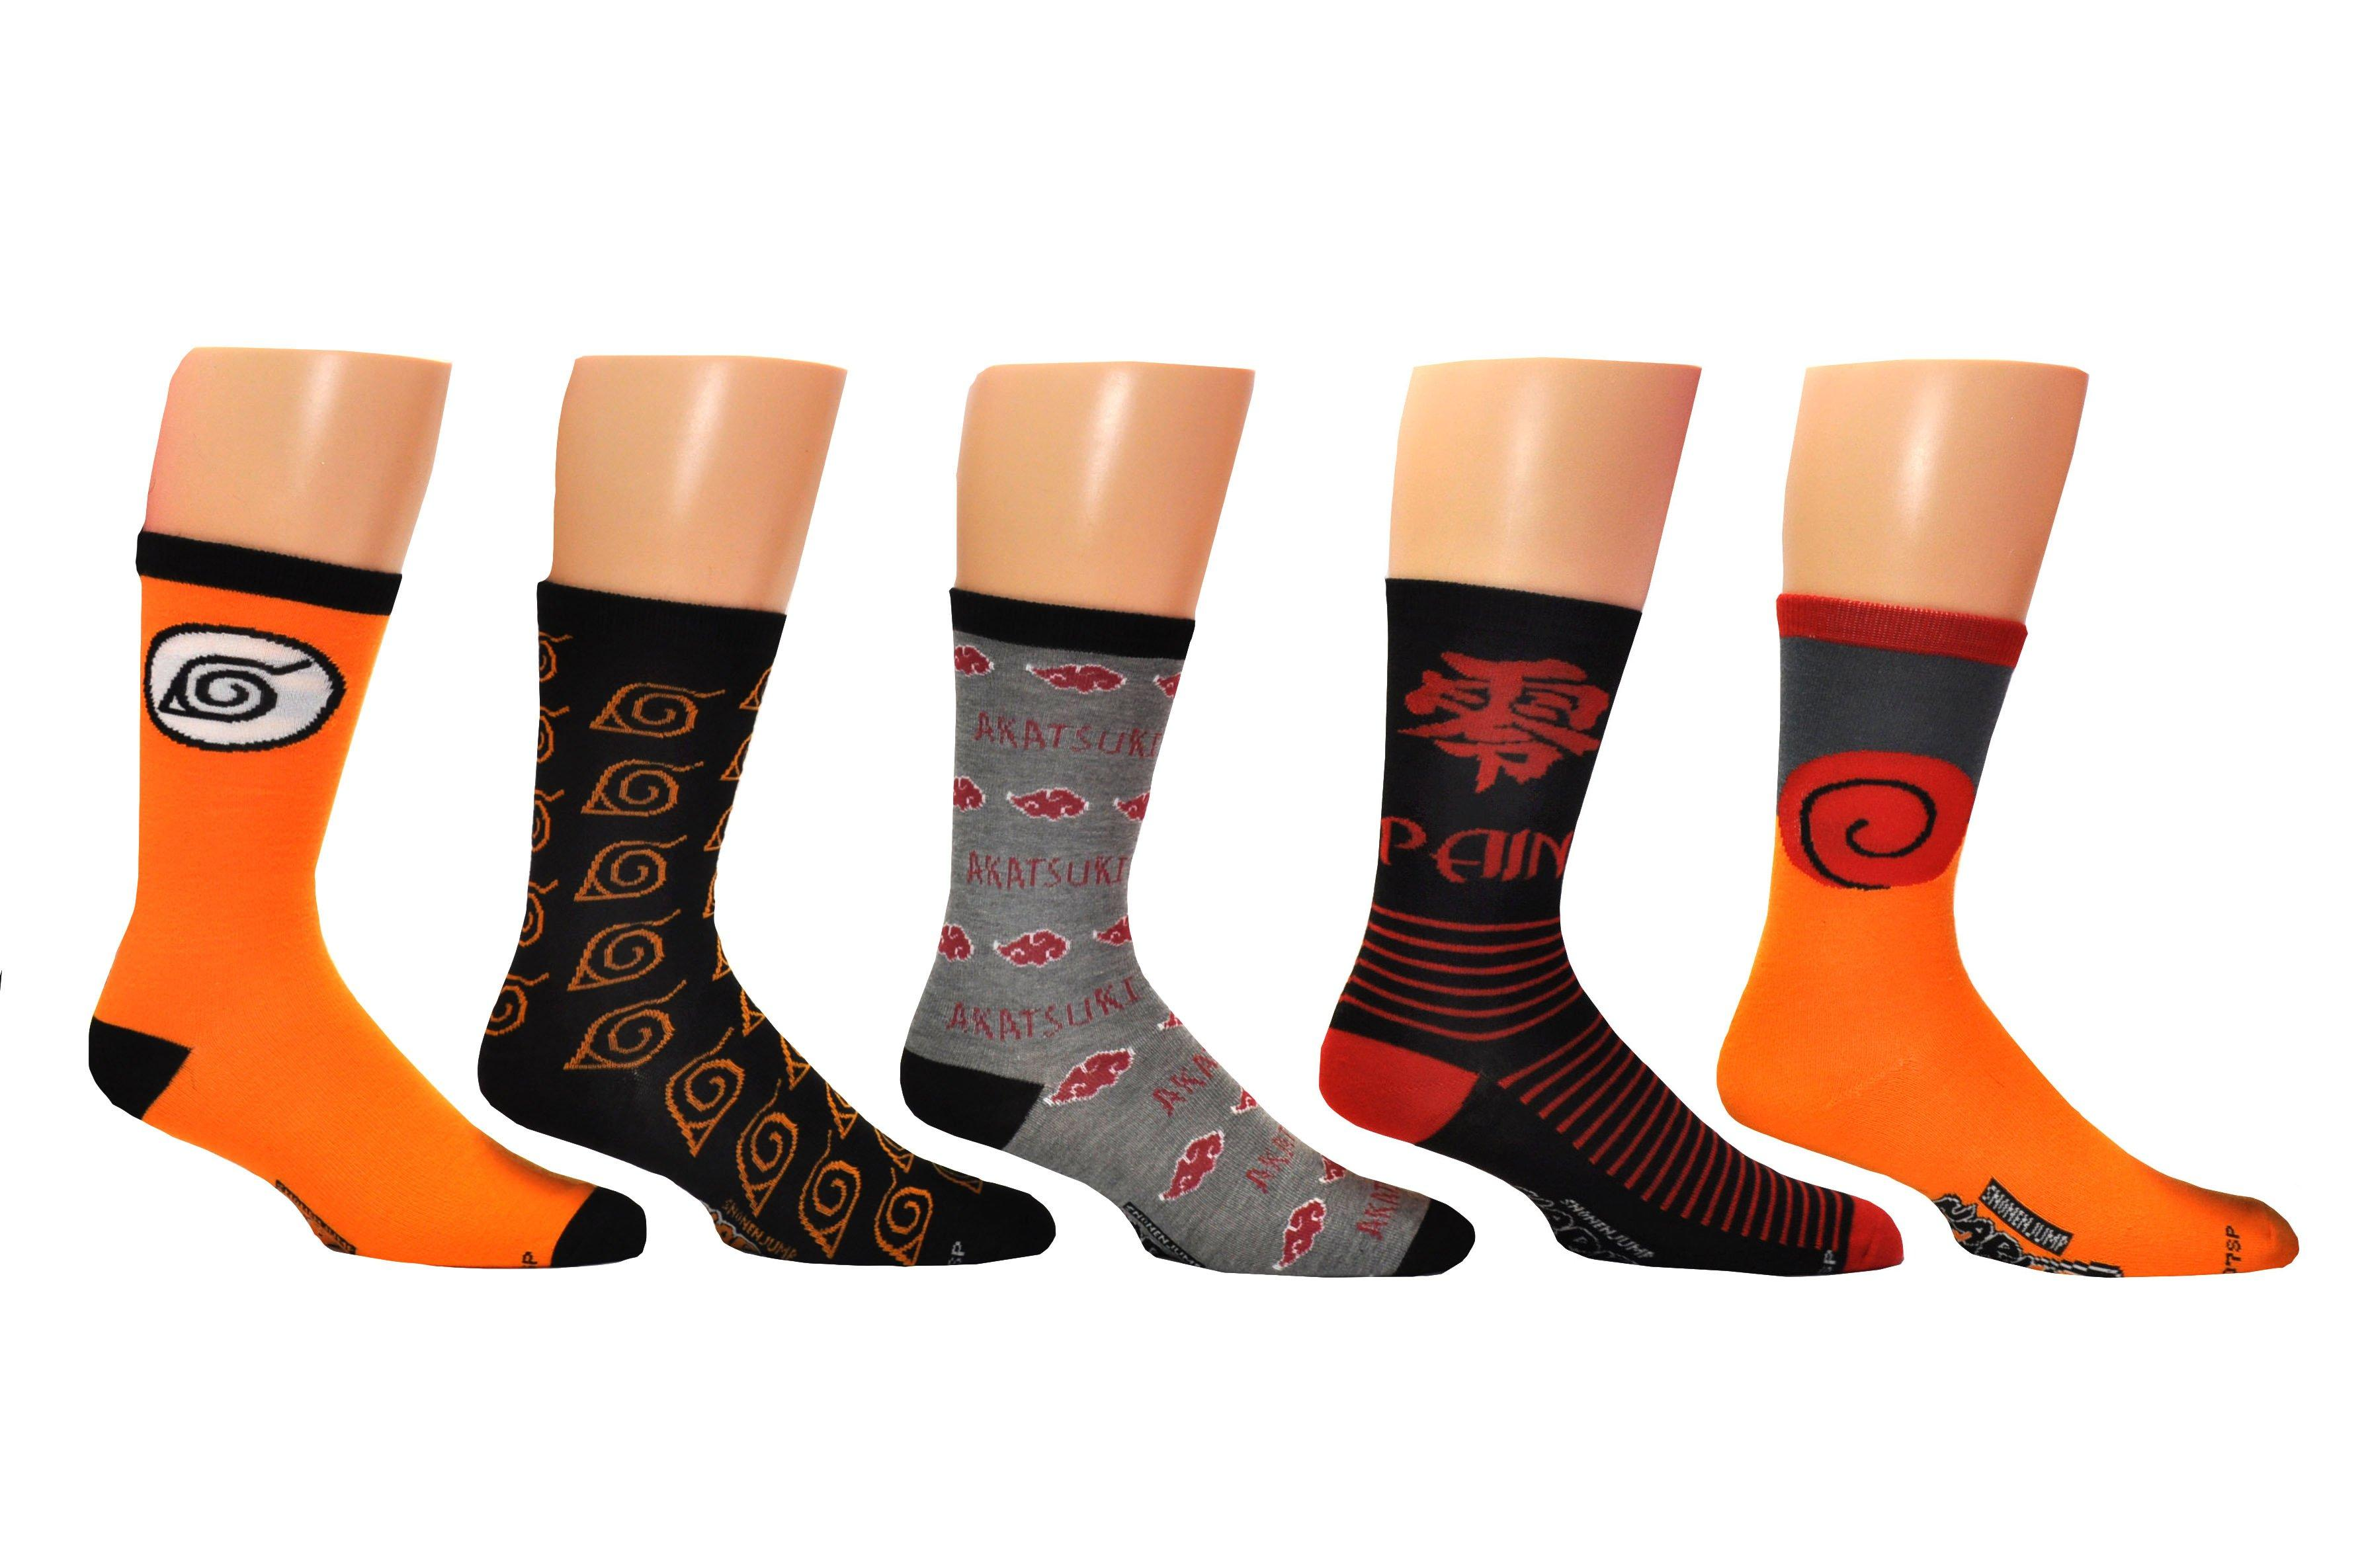 Naruto Shippuden Unisex Low Cut Socks 5-Pack Assortment NR-0043